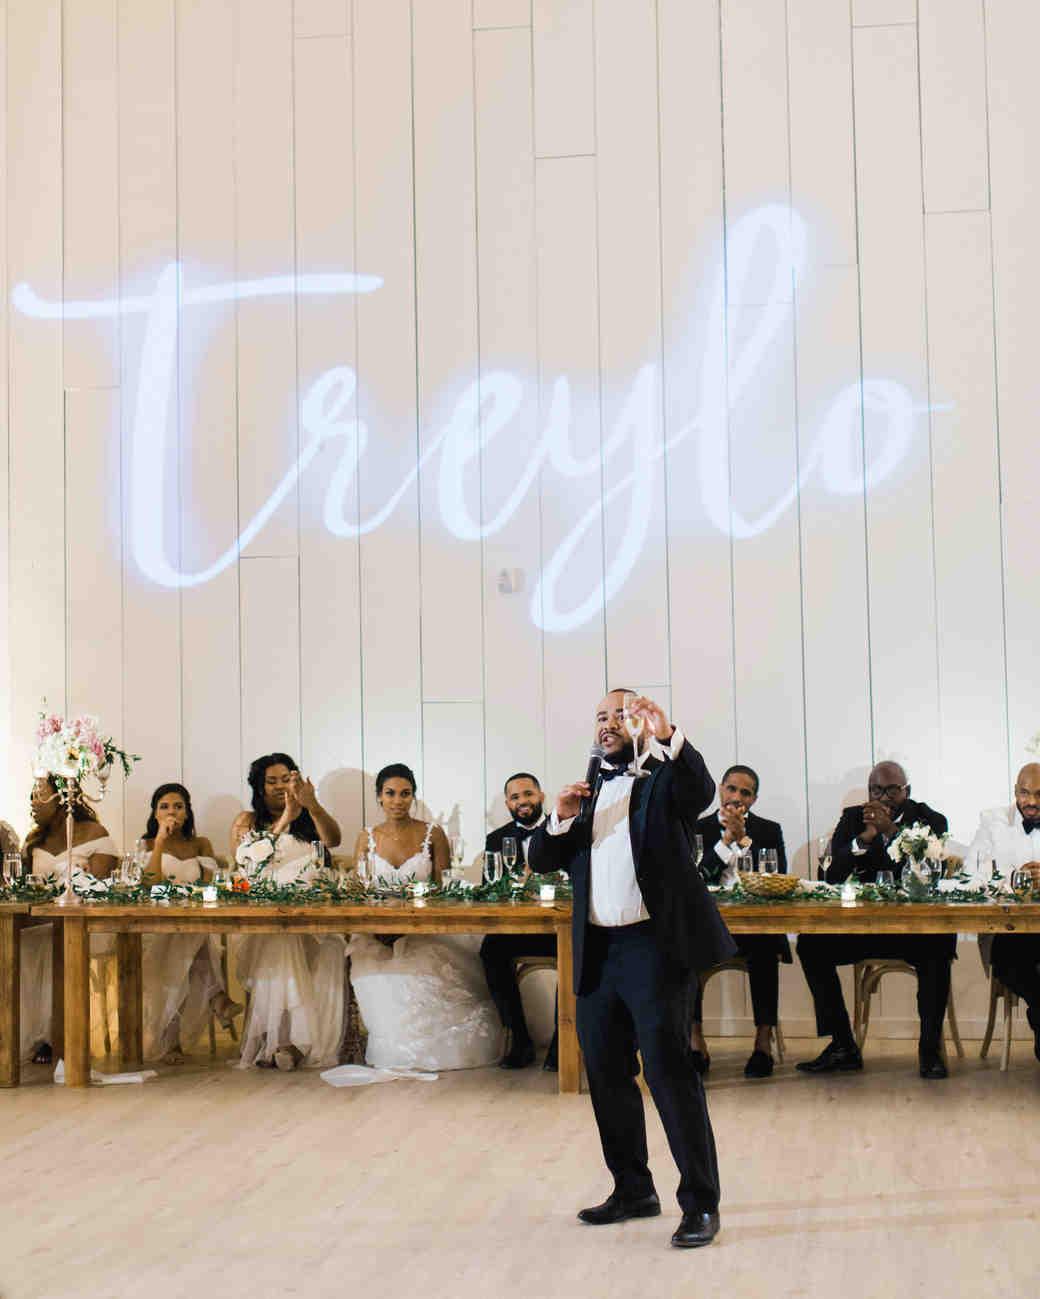 wedding best man toast name on wall